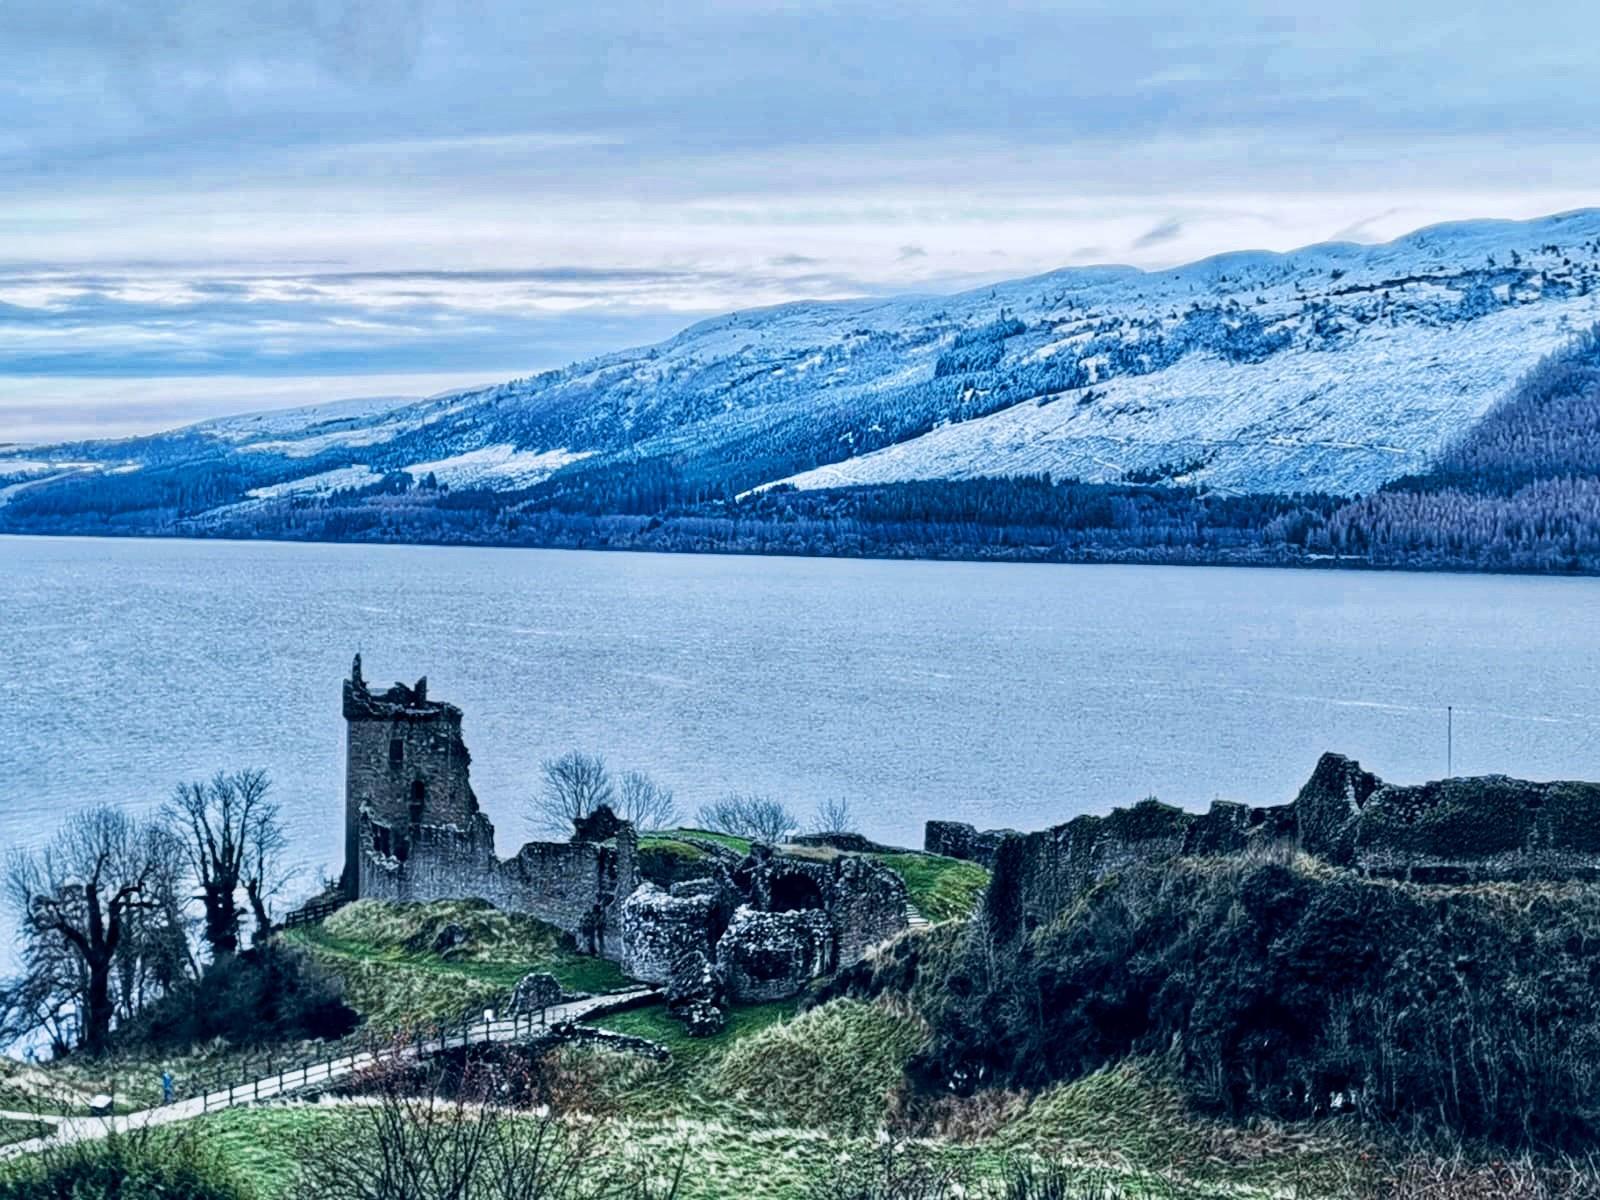 Urquhart Castle Snow Loch Ness